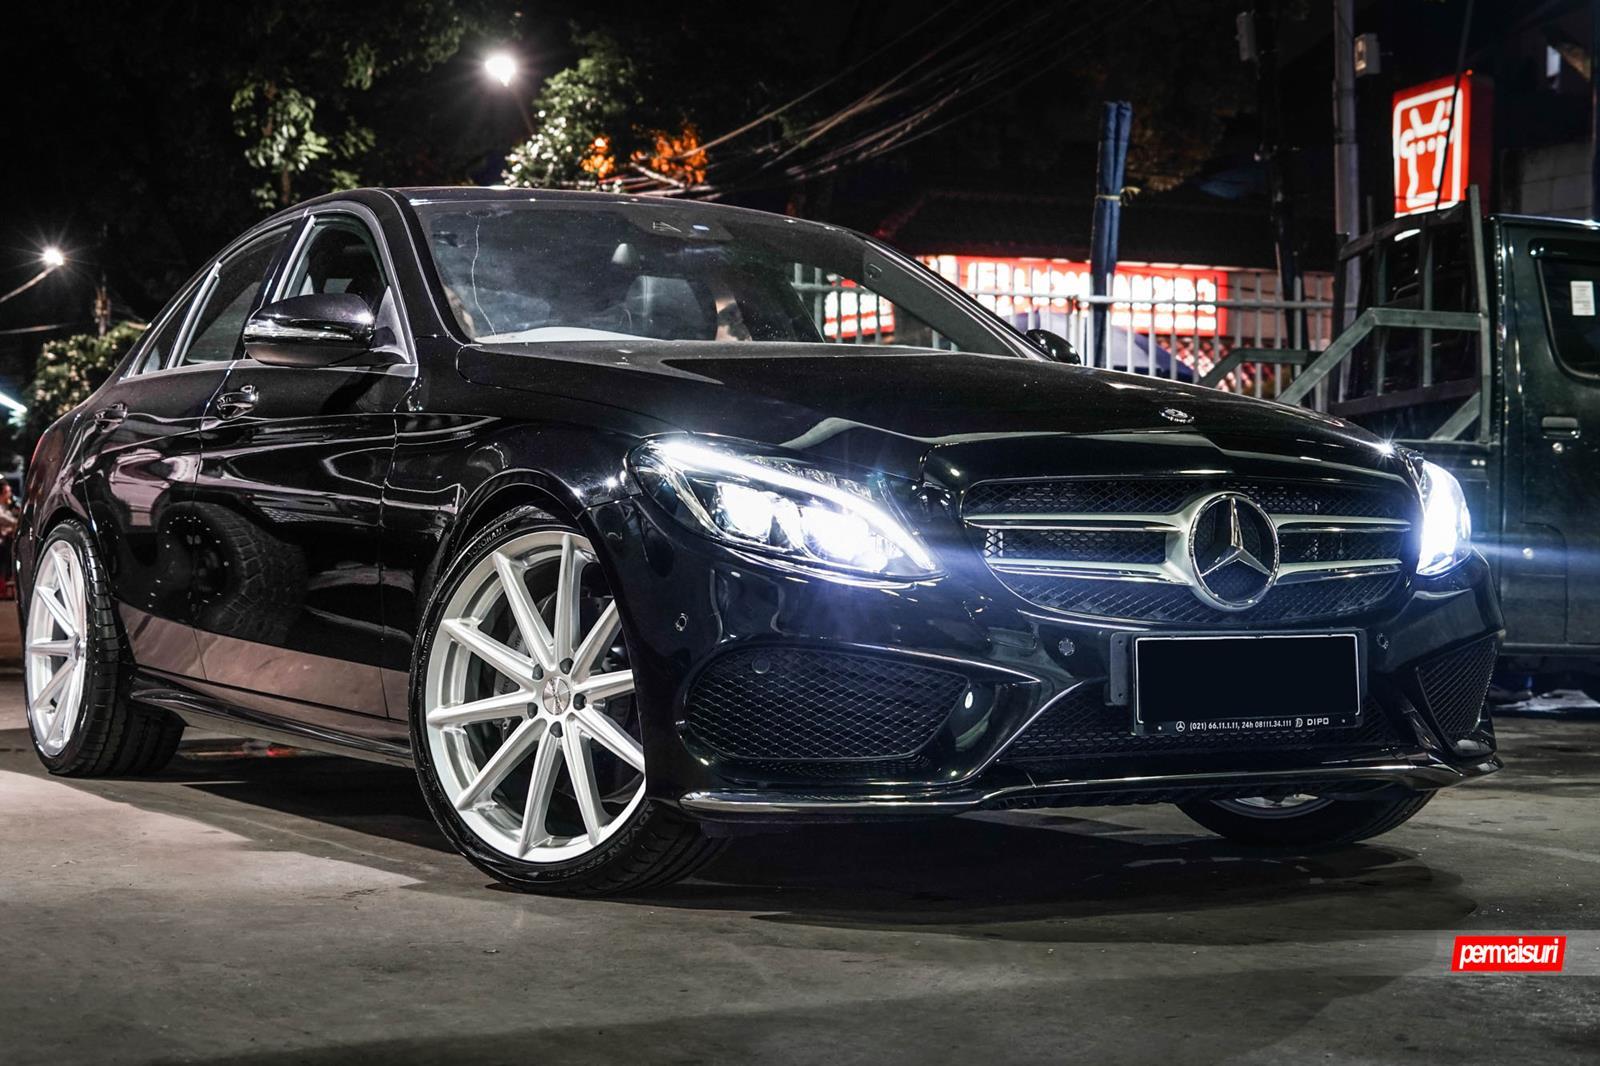 Mercedes benz c class vossen flow formed series vfs 10 for Mercedes benz c class rims